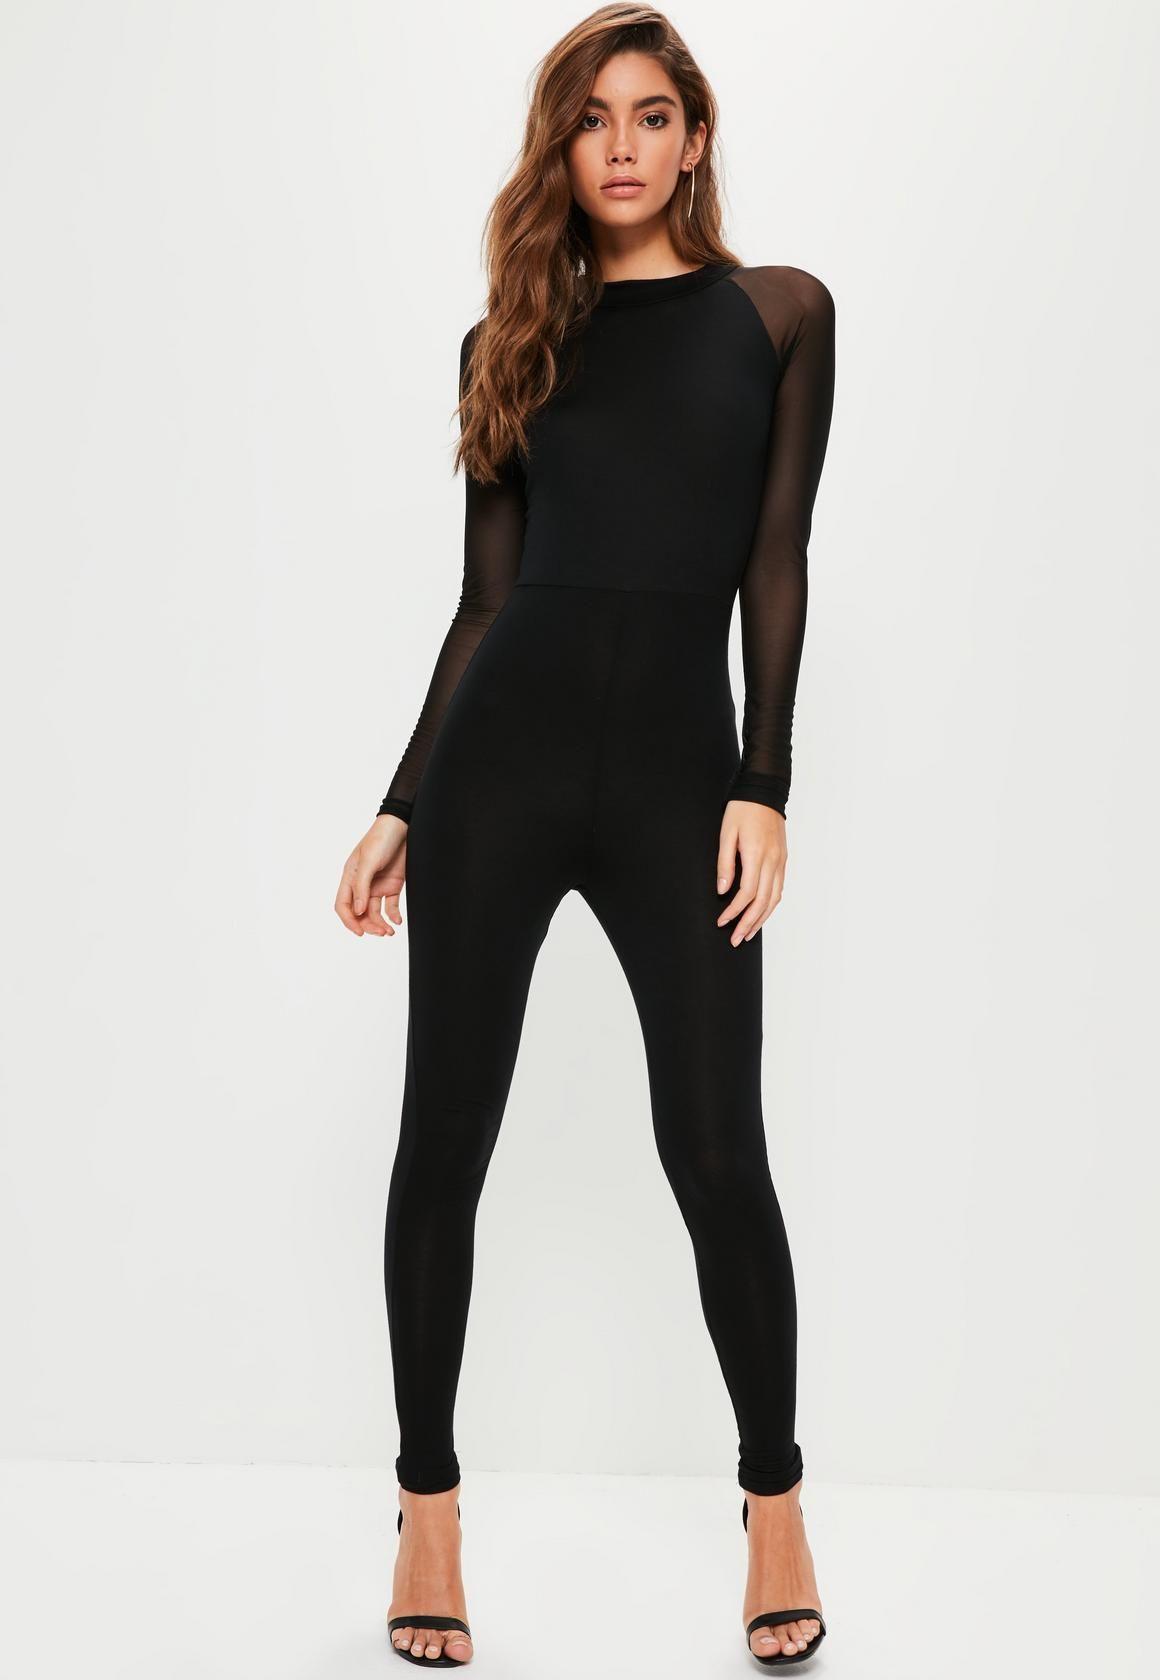 Missguided , Black Mesh Sleeve Jersey Unitard Jumpsuit